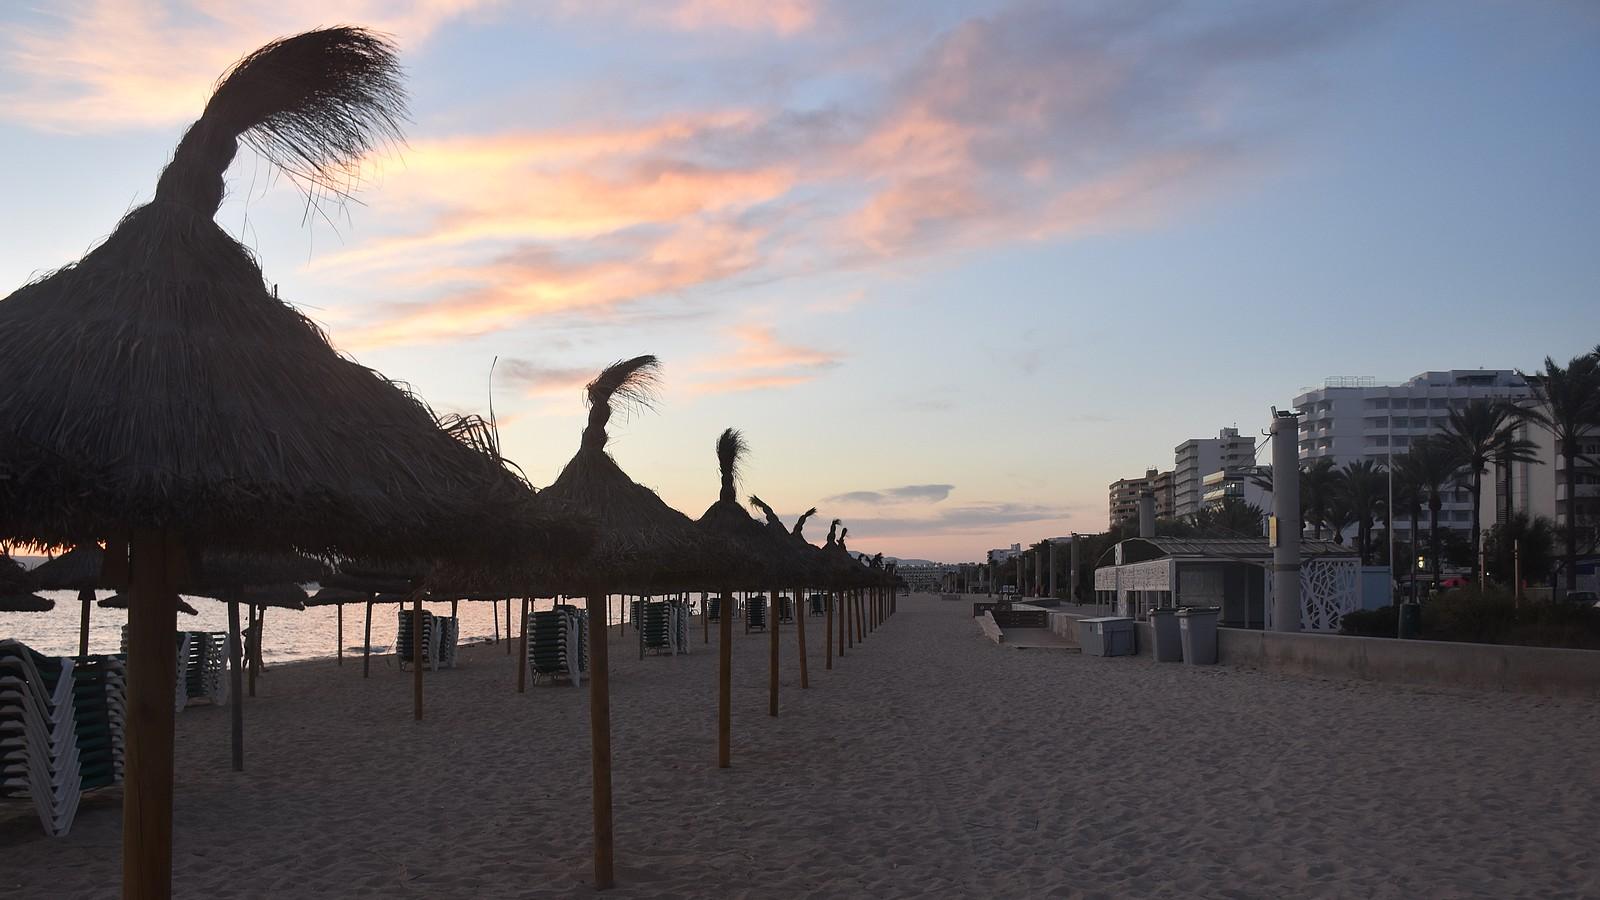 Playa de Palma in Mallorca